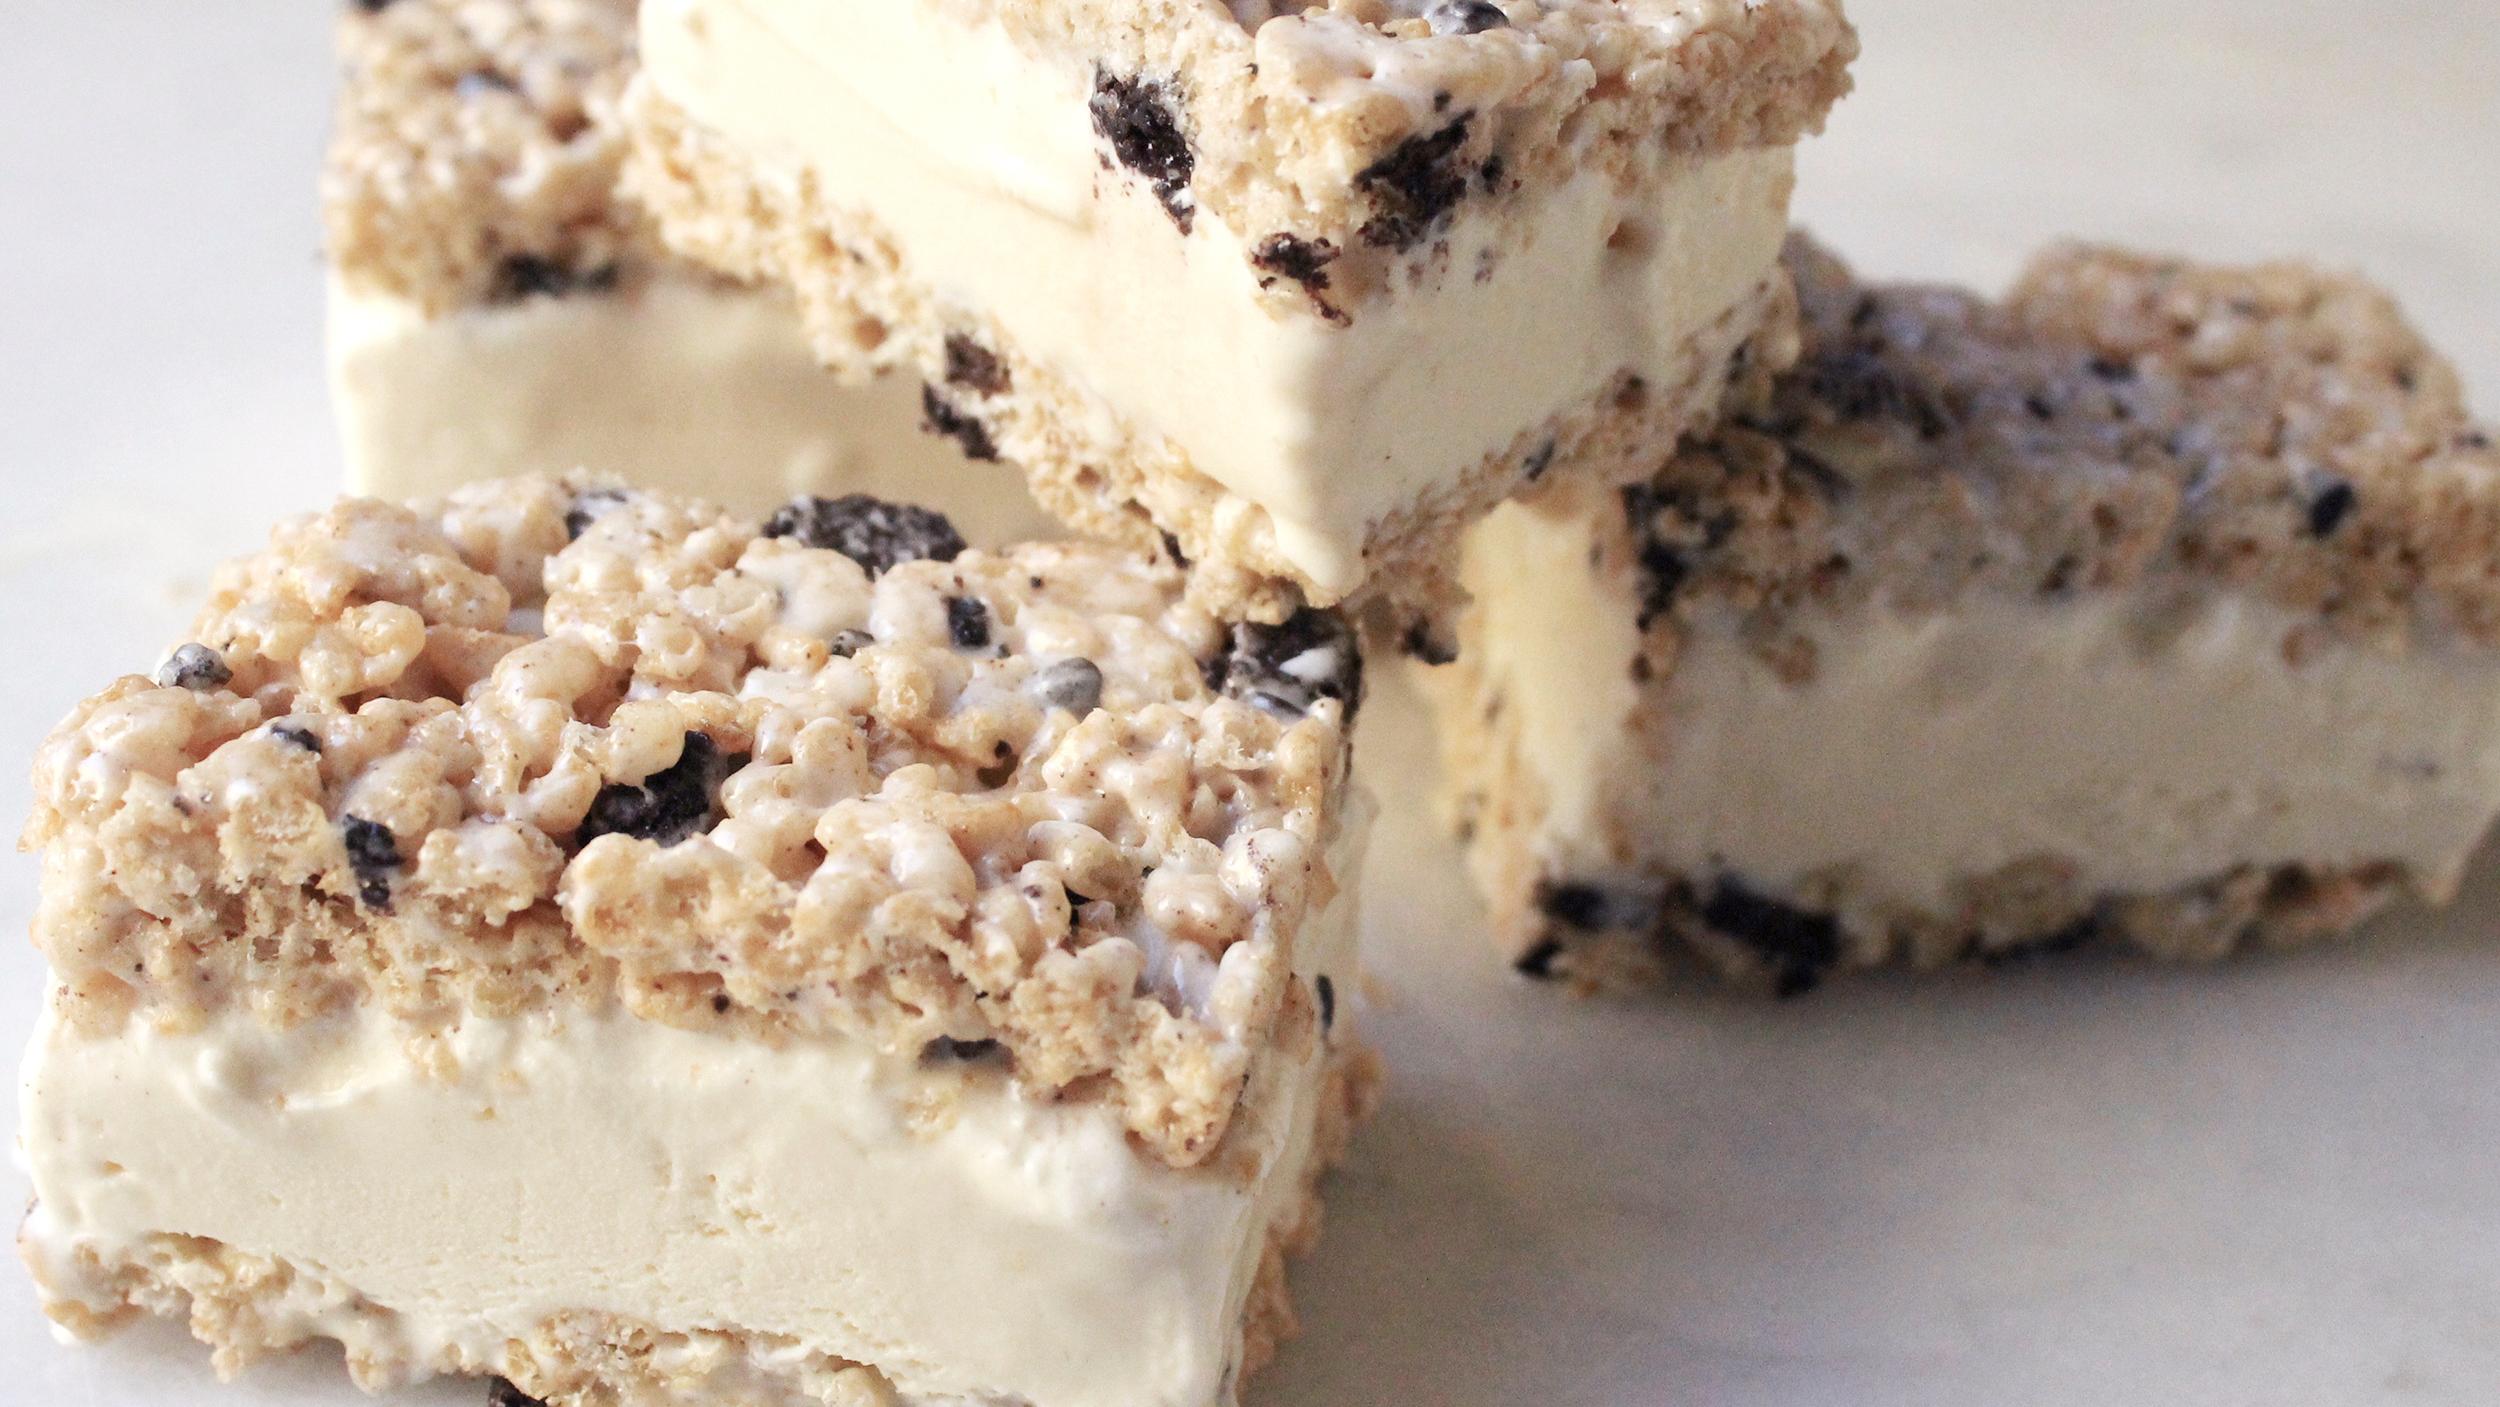 Cookies & Cream Rice Krispies Treat Ice Cream Sandwiches ...